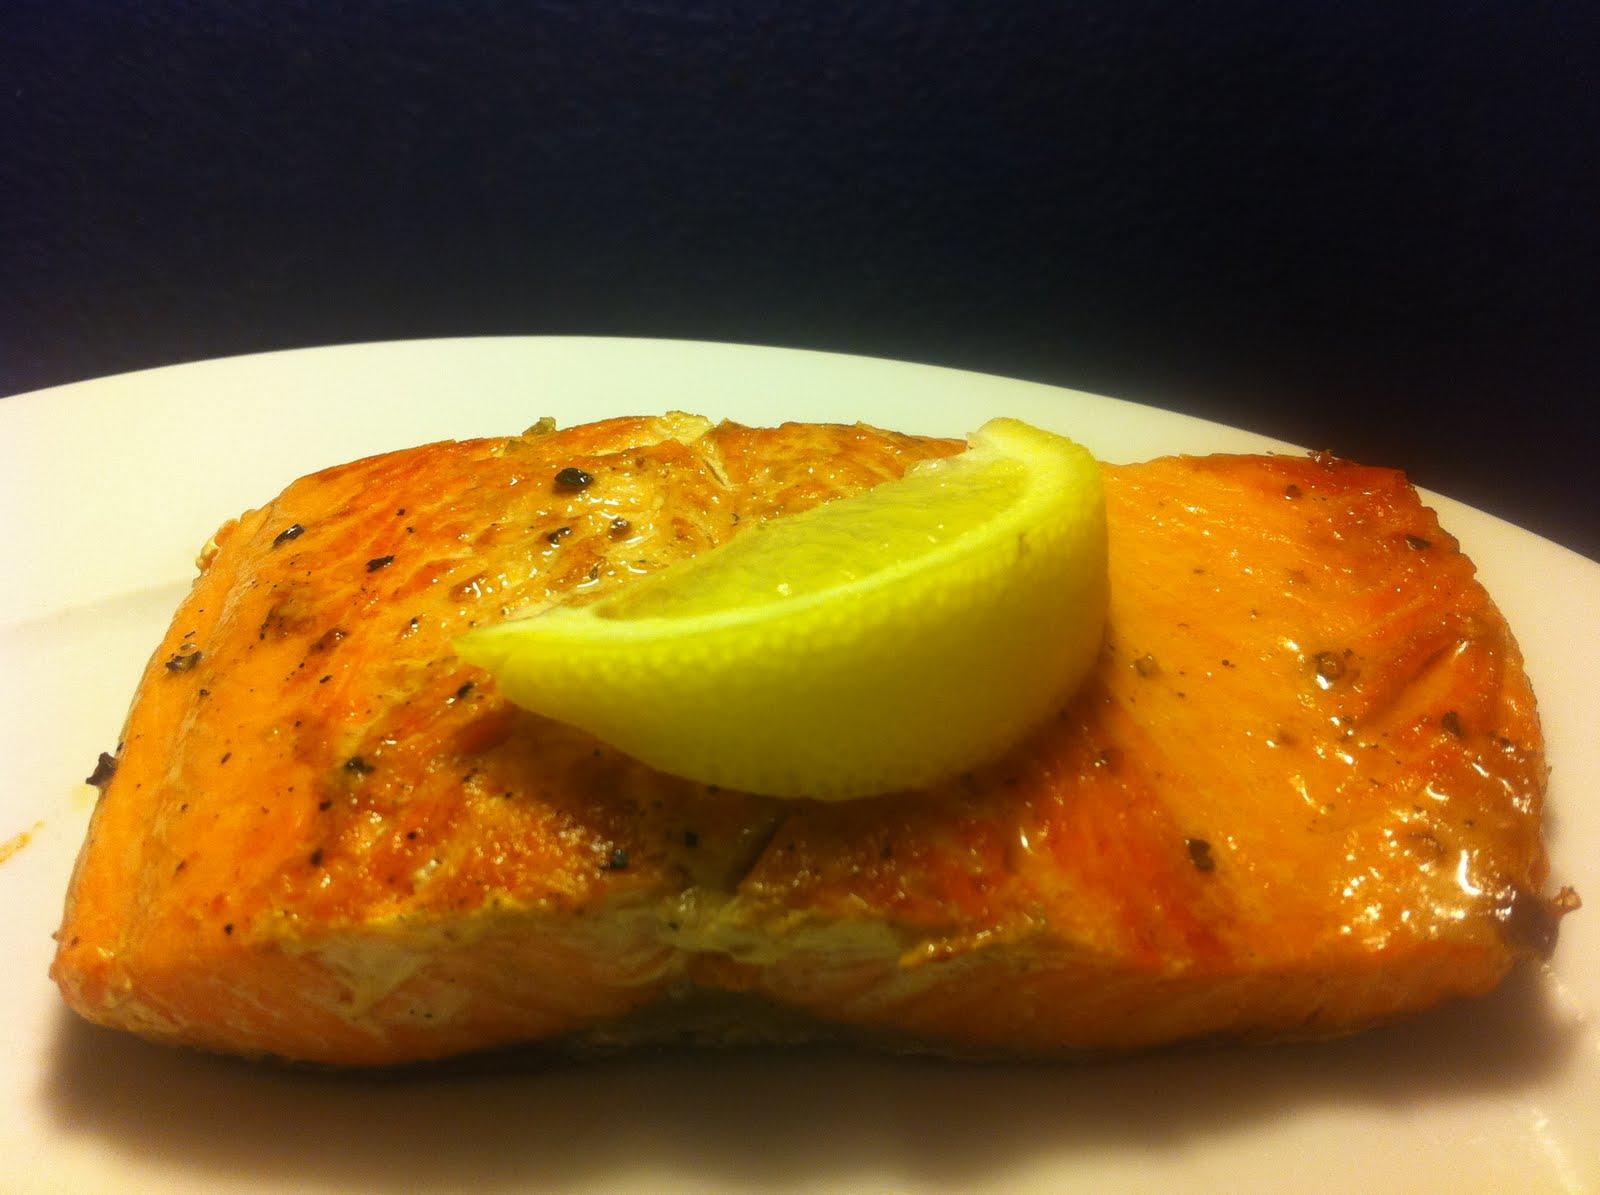 Recipe: Panseared Salmon In Cast Iron